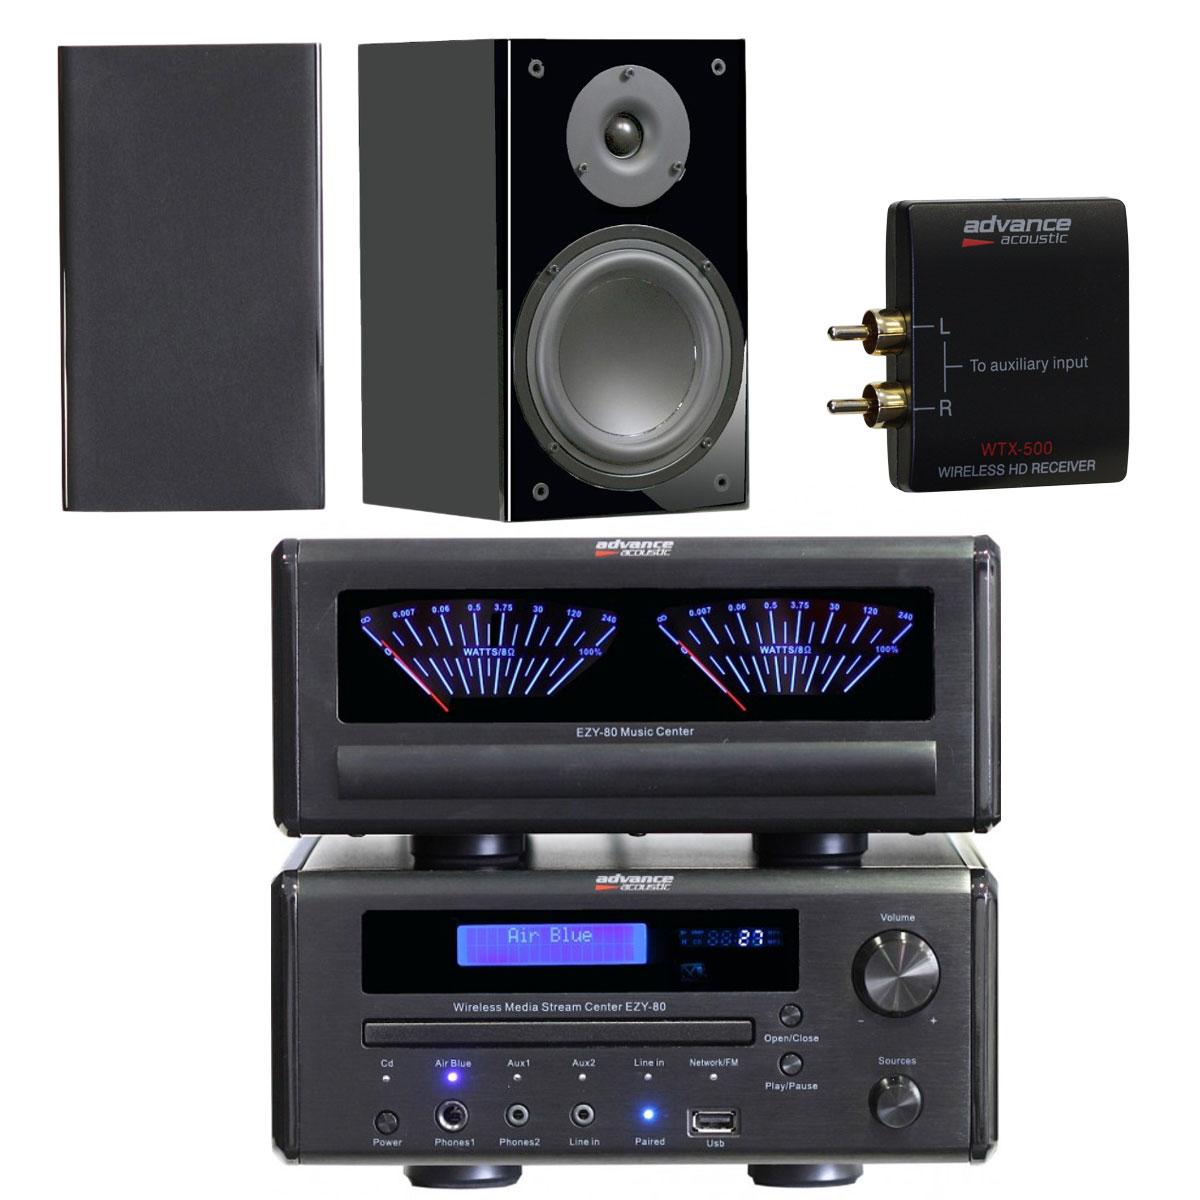 advance acoustic ezy 80 advance acoustic k1 advance acoustic wtx 500 ensemble hifi advance. Black Bedroom Furniture Sets. Home Design Ideas